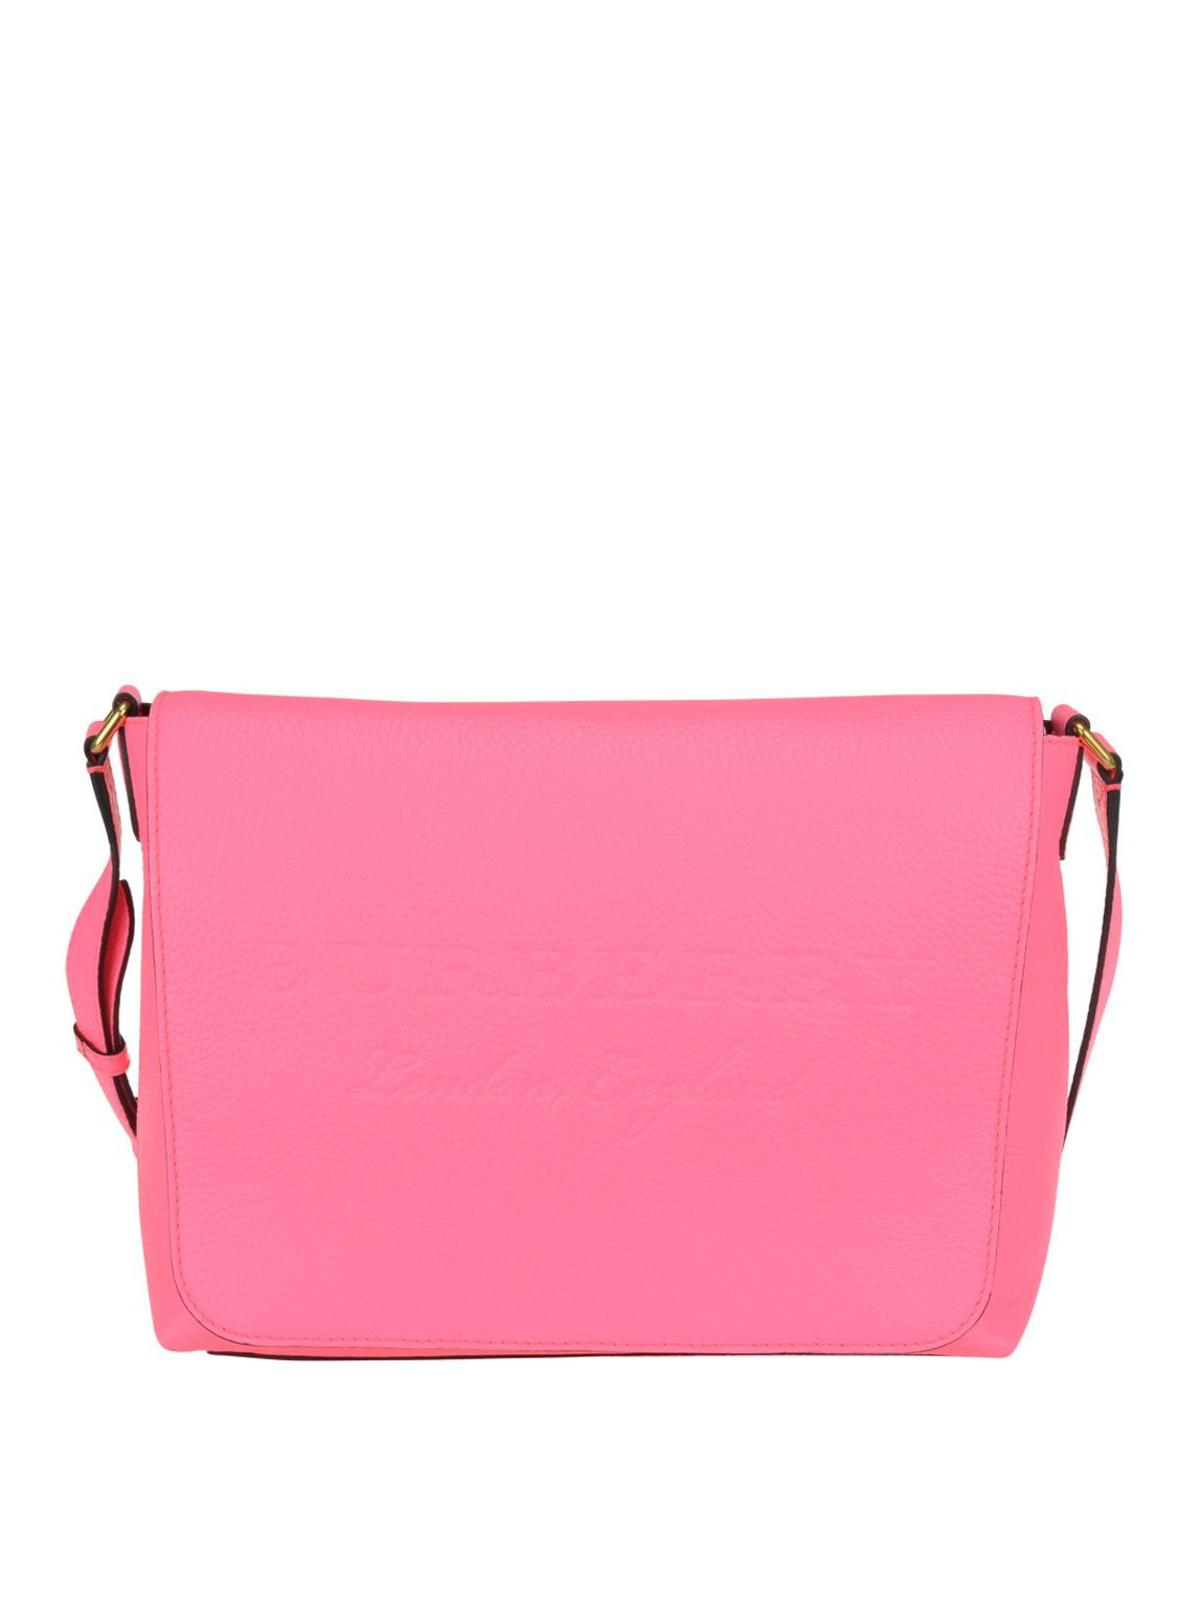 d05115d46b41 Burberry - Embossed logo neon leather bag - cross body bags - 4068502